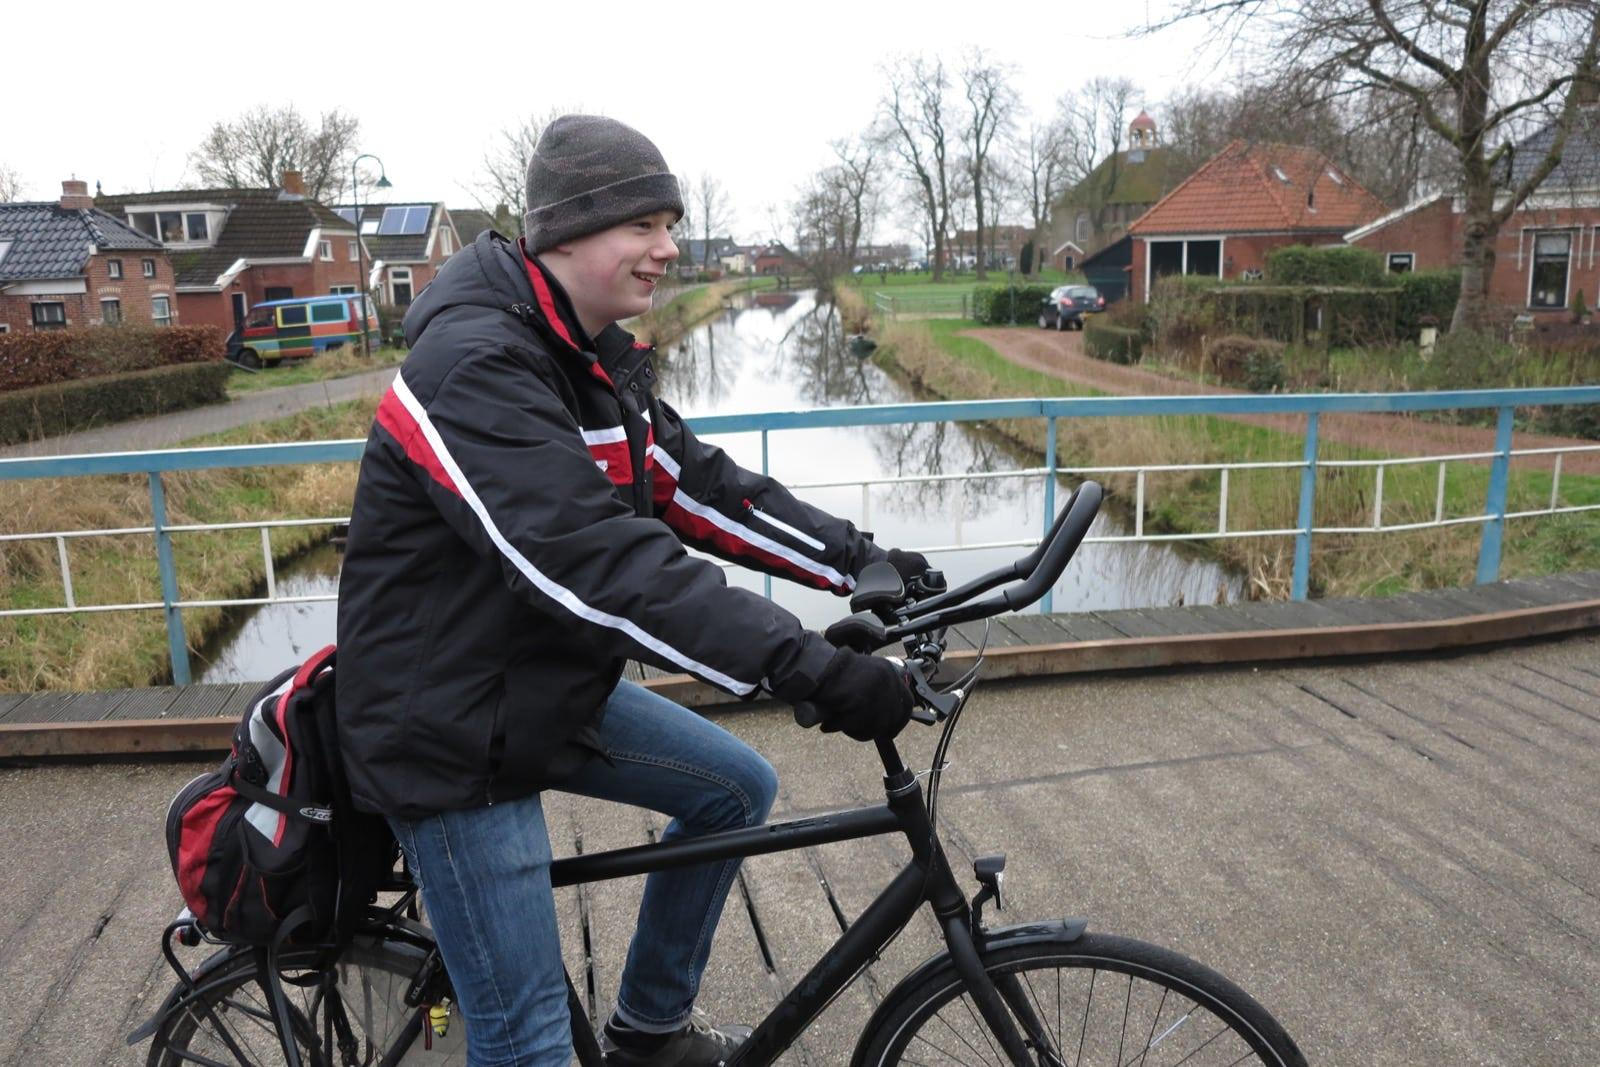 et-fiets-en-fietser-04-sander-ganzeveld-oi.jpg